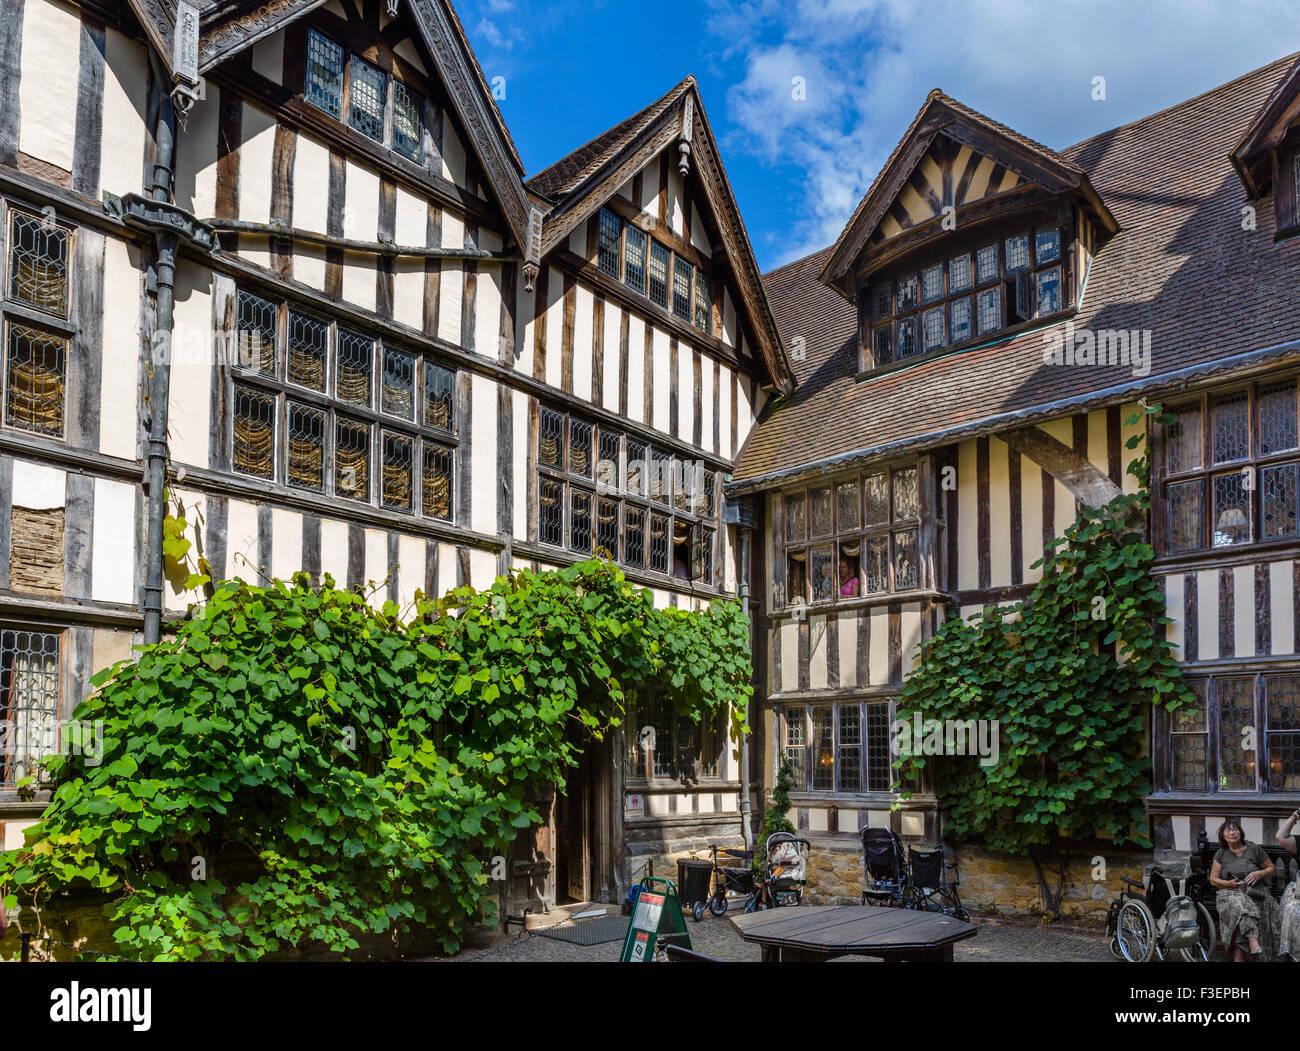 Courtyard in Hever Castle, family home of Anne Boleyn, Hever, Kent, England, UK - Stock Image